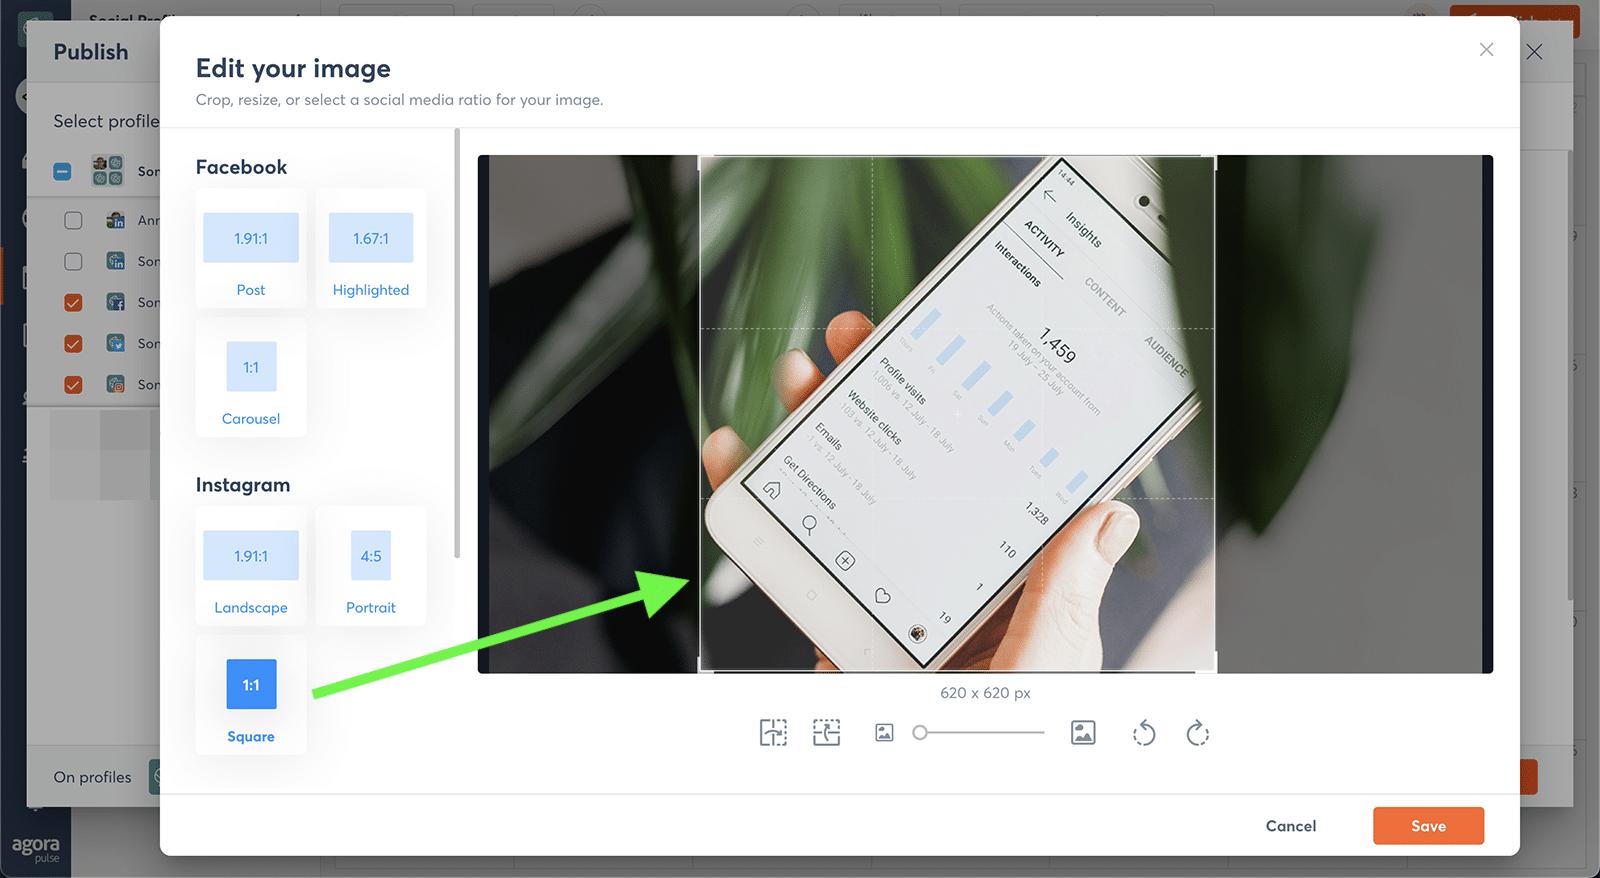 edit social media images with Agorapulse